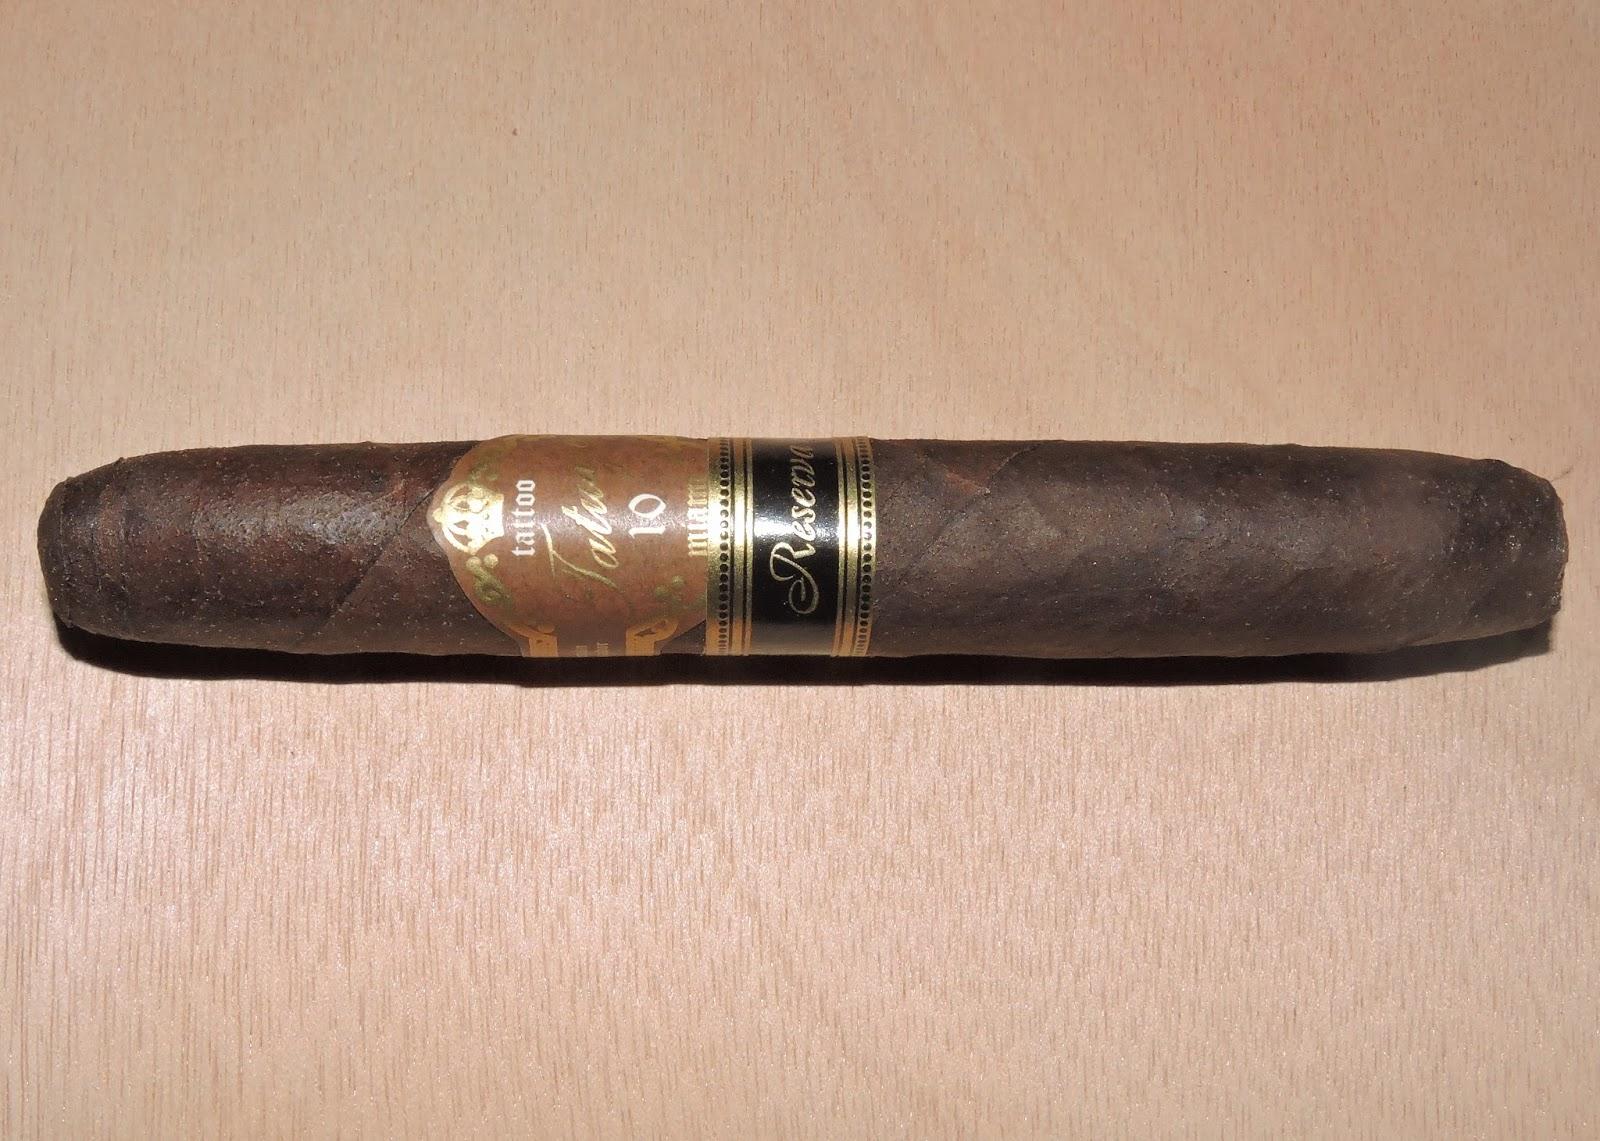 Agile Cigar Review: Tatuaje 10th Anniversary Belle Encre Reserva